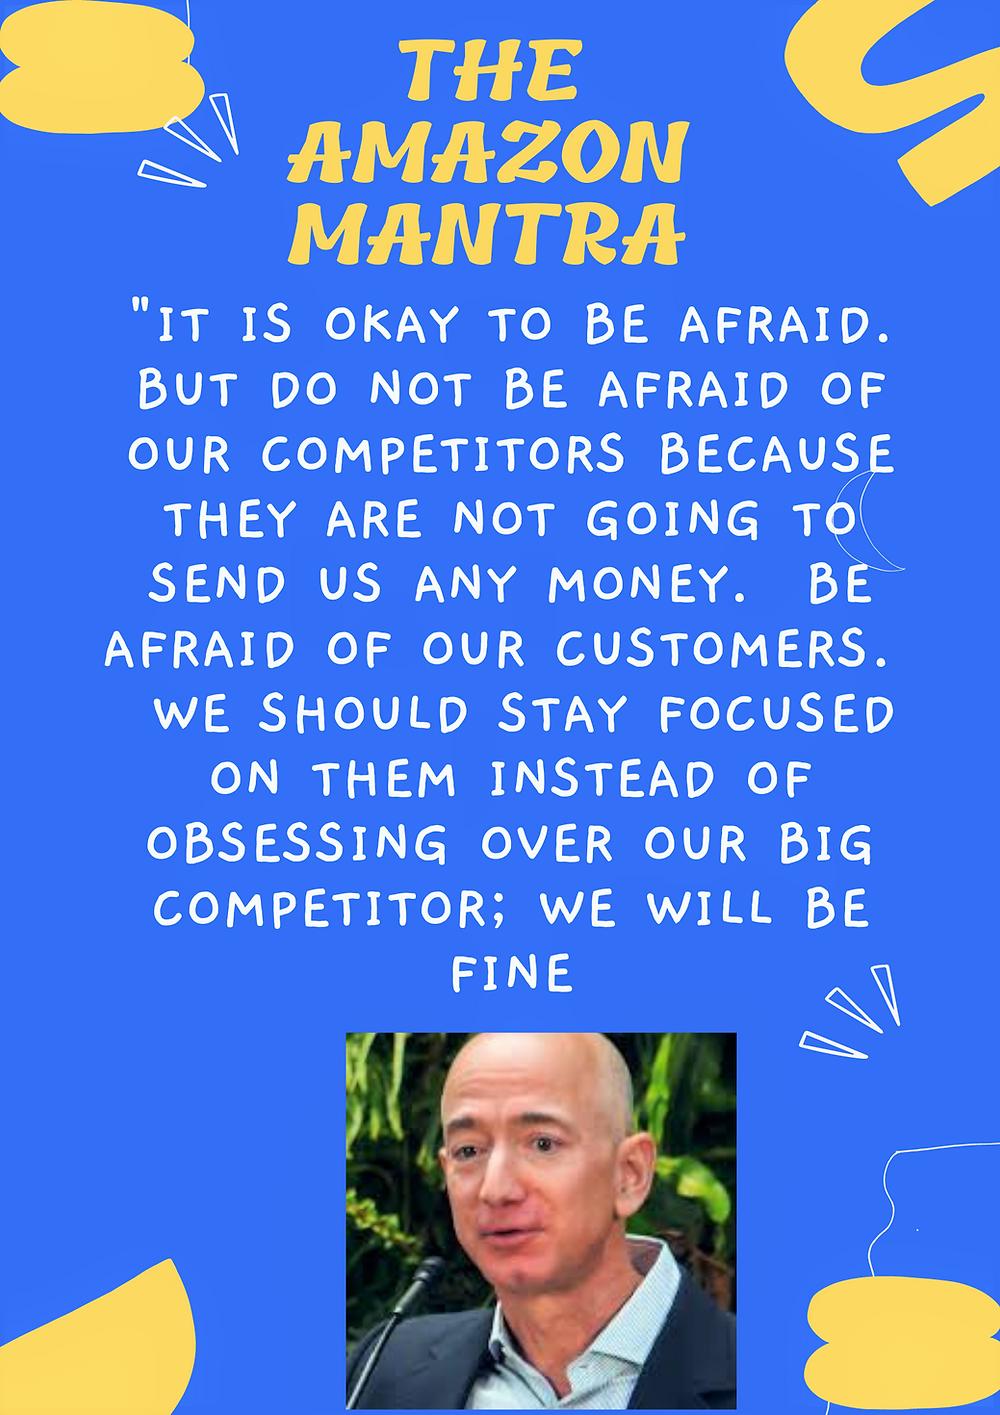 Amazon Mantra on Customer